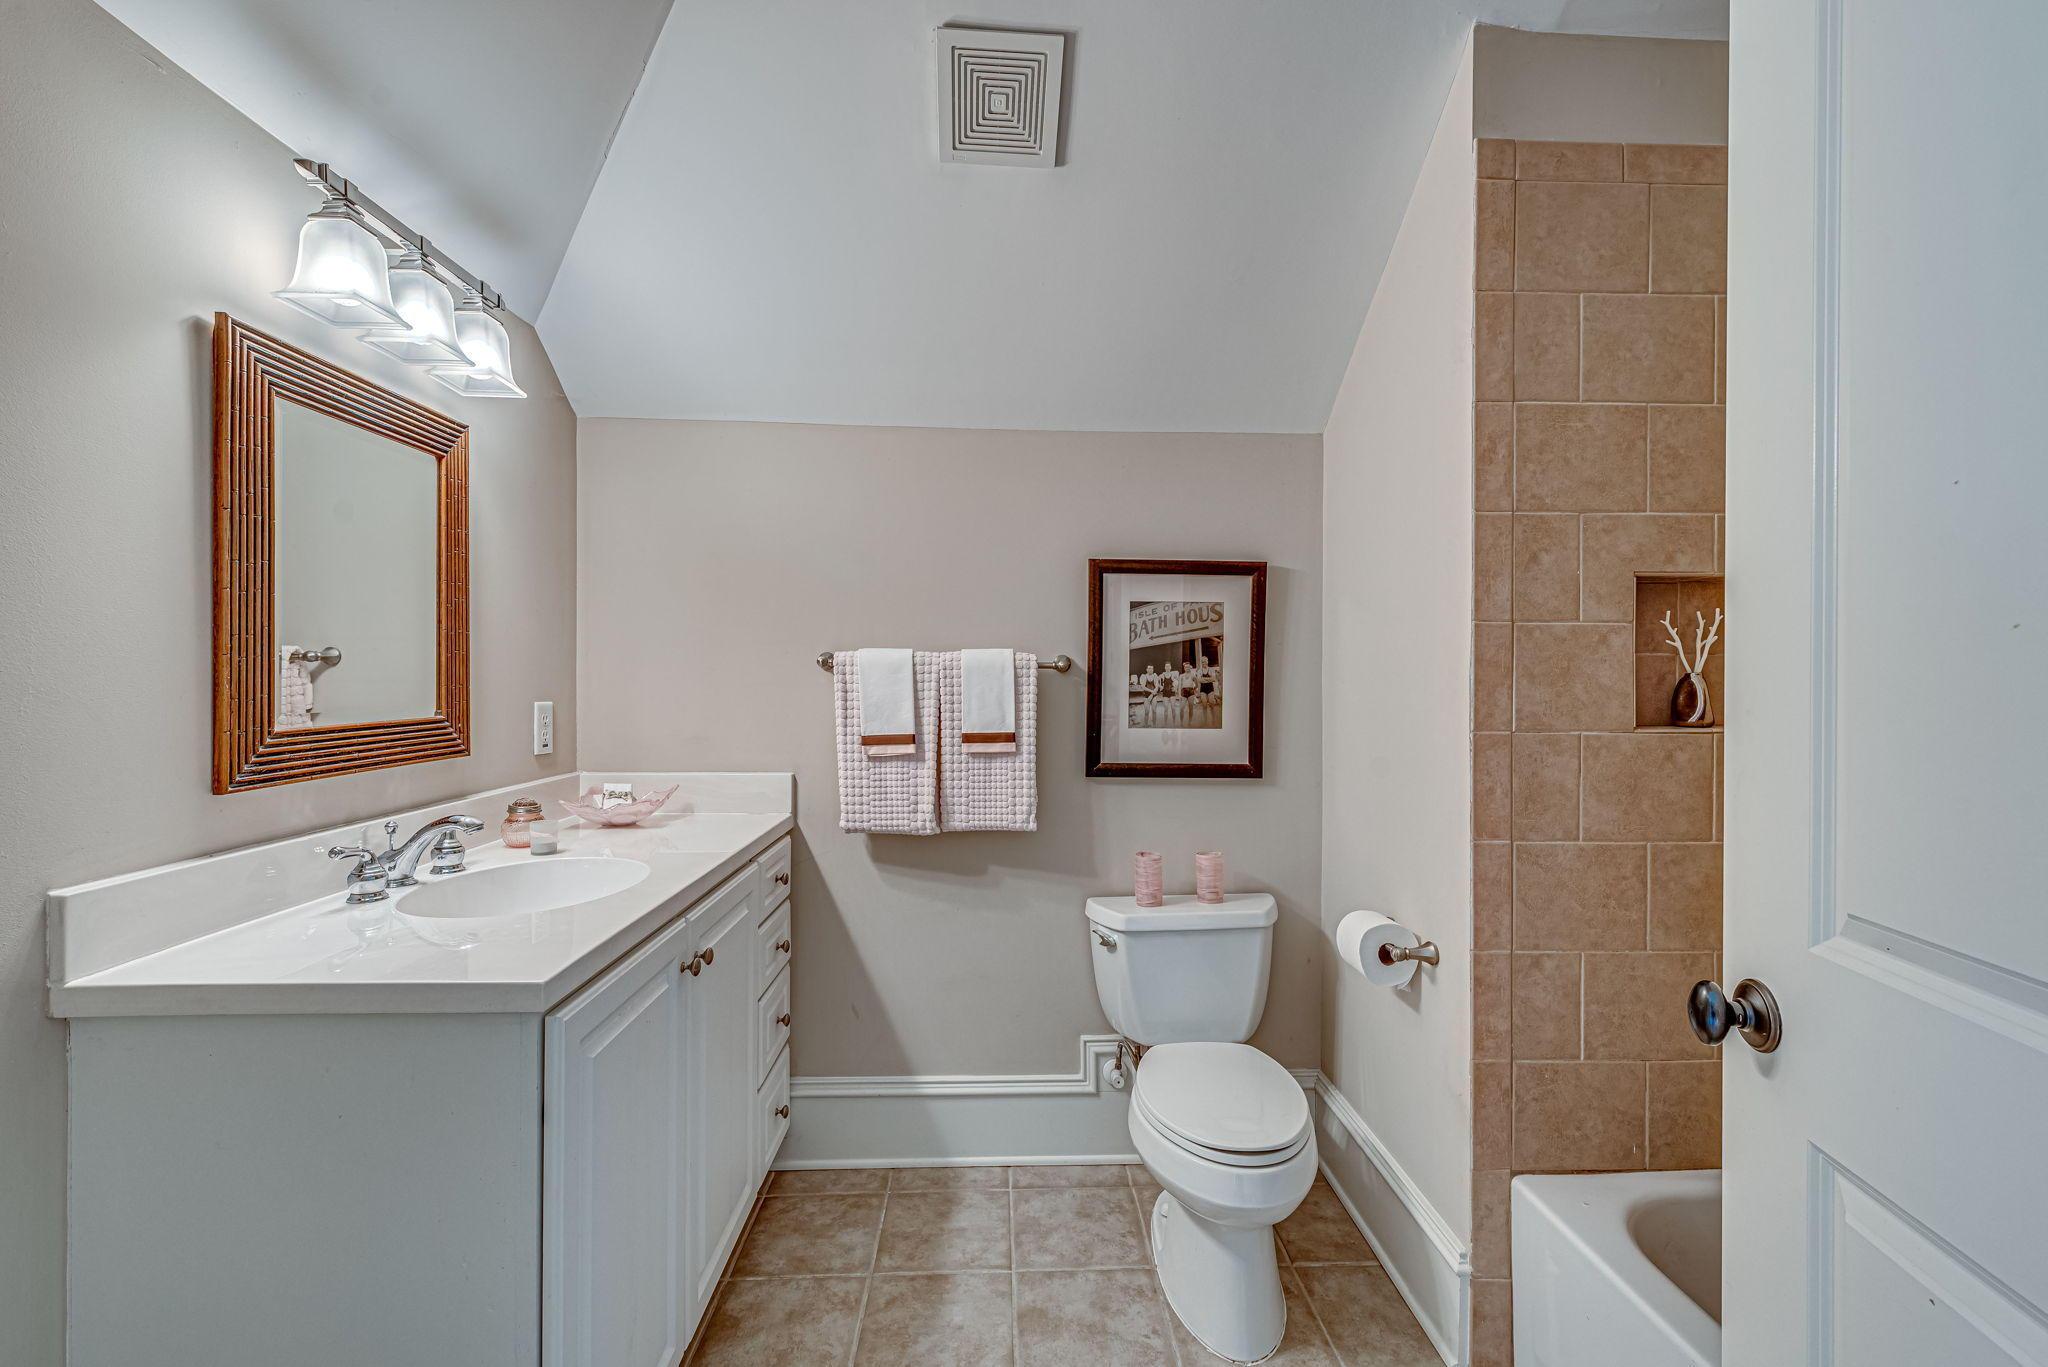 Darrell Creek Homes For Sale - 3794 Saint Ellens, Mount Pleasant, SC - 11